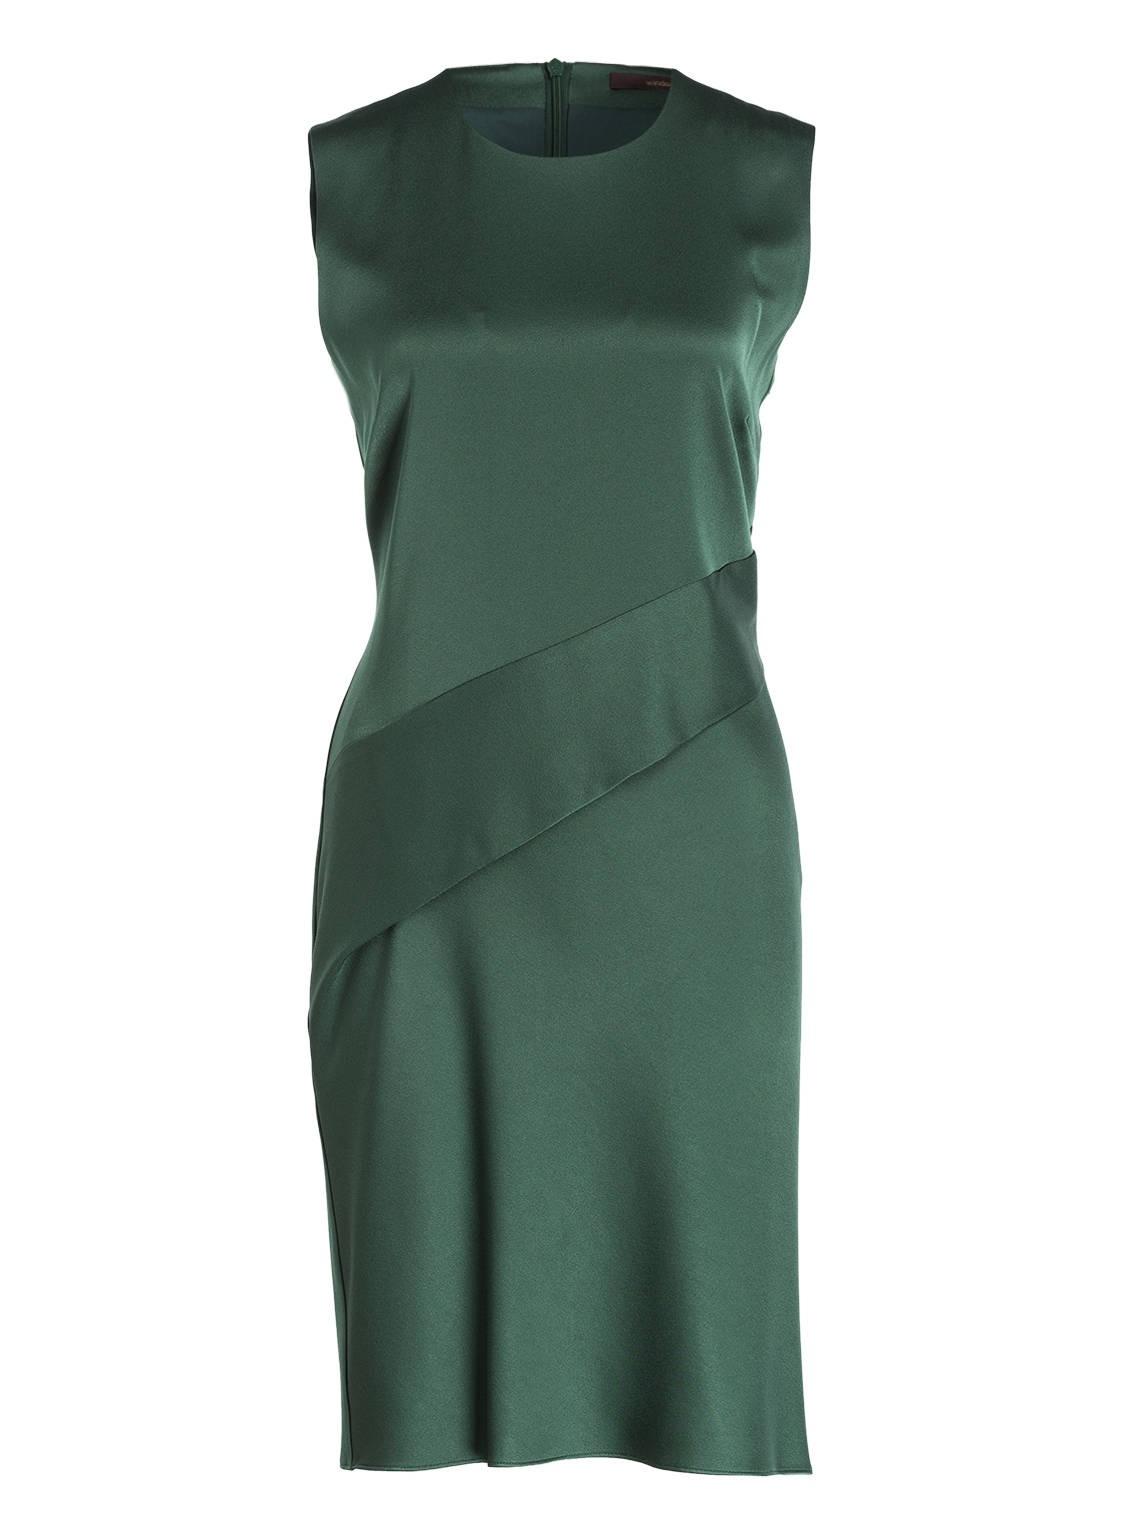 Genial Damen Kleider Knielang Elegant Vertrieb20 Schön Damen Kleider Knielang Elegant Stylish